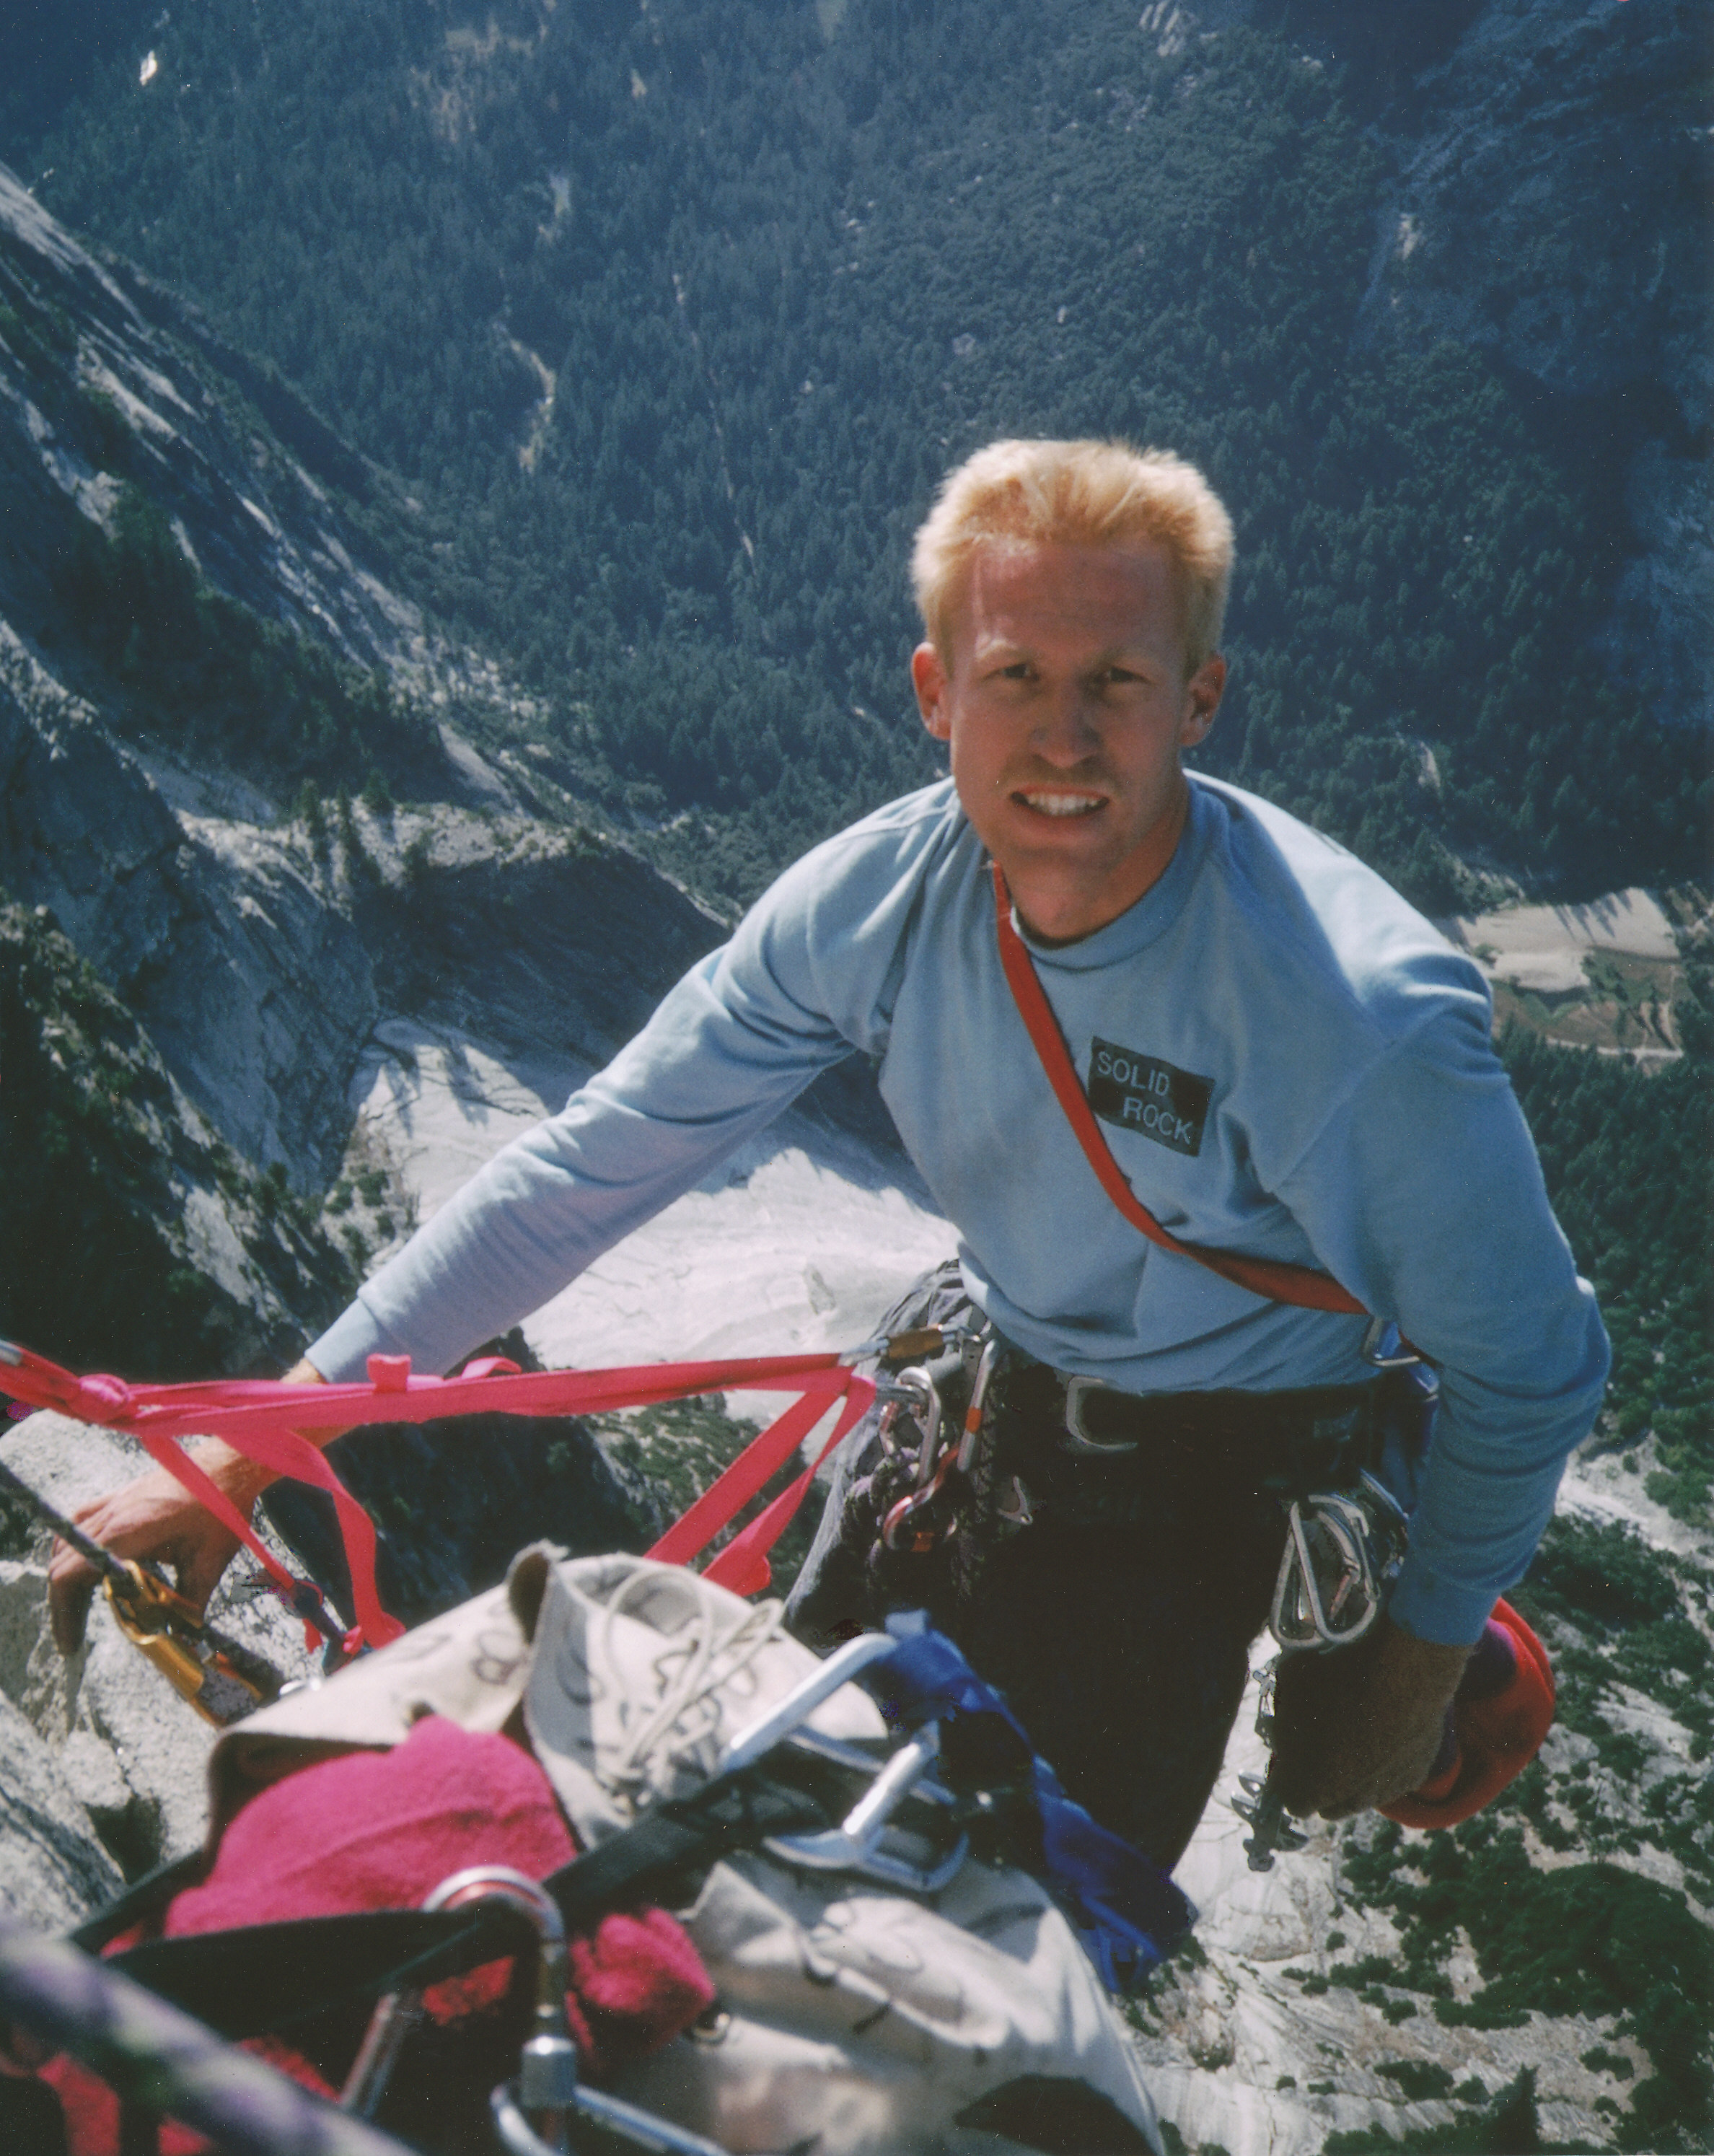 IMG Climbing shots_0004.jpg